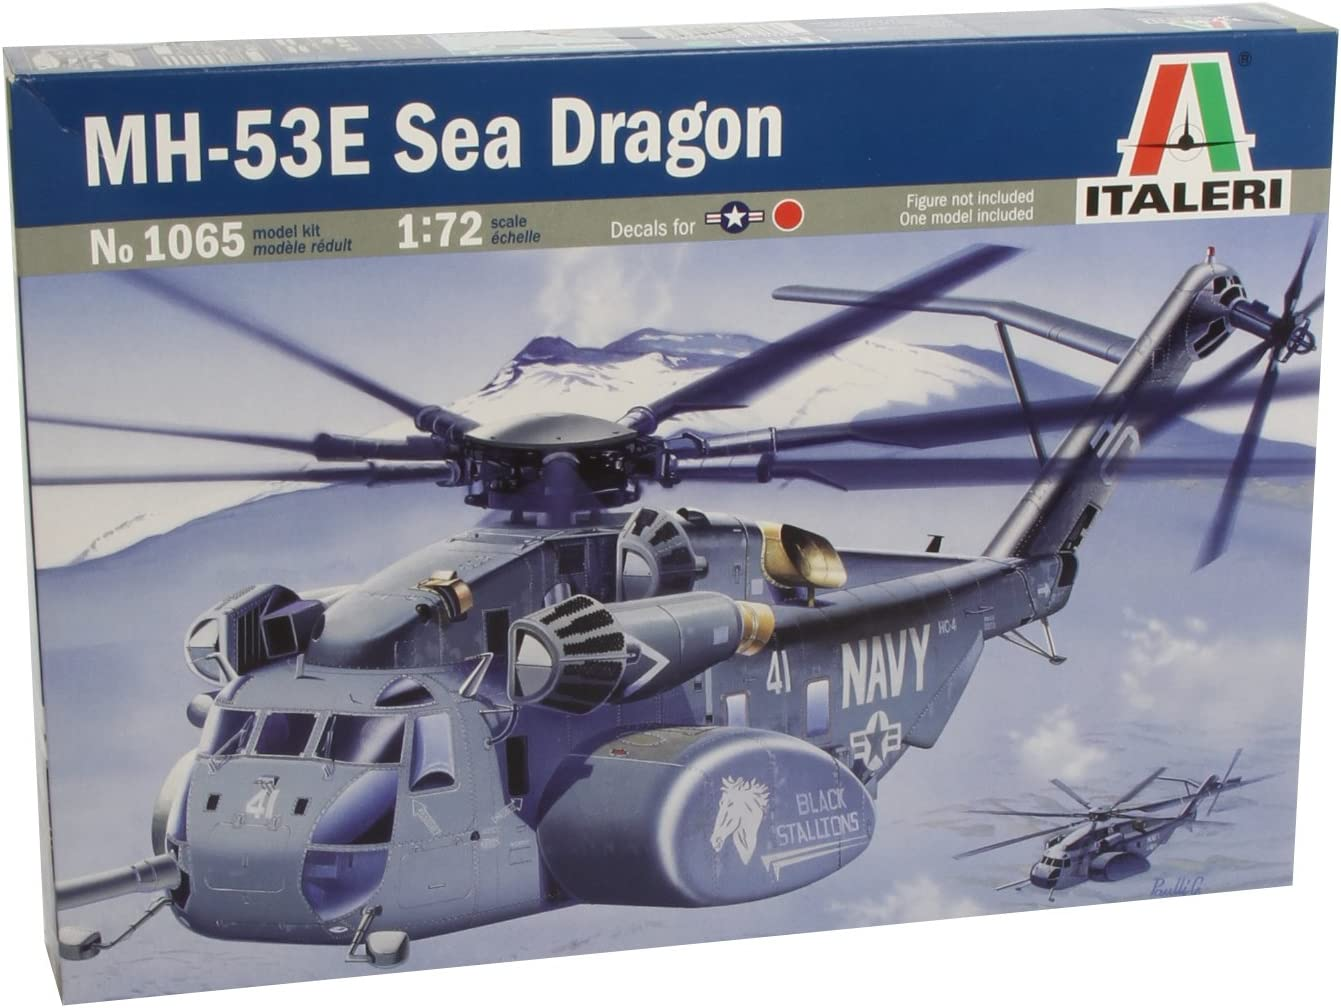 1:72 Mh-53e Sea Dragon Helicopter Model Kit